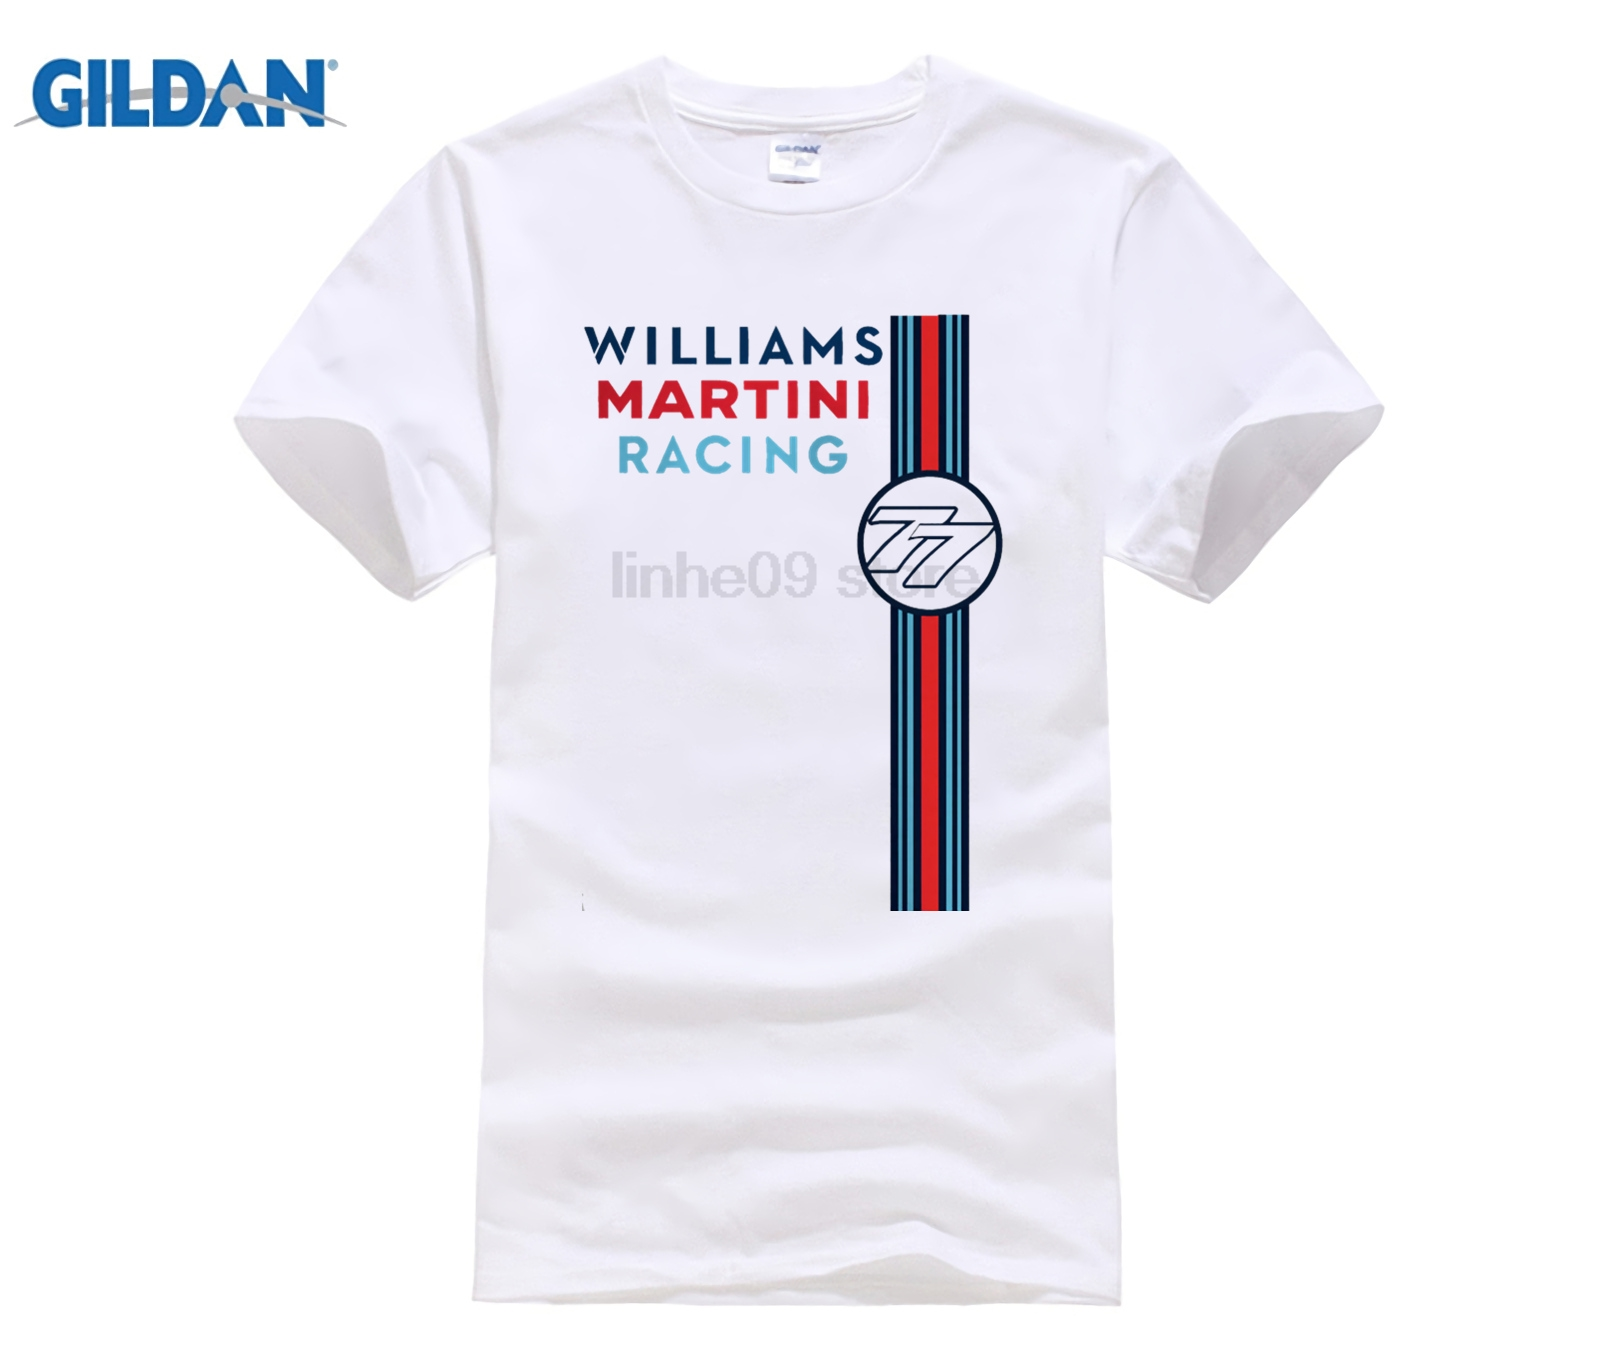 6e21fc8375956 2019 caliente de verano de los hombres T camisa moda película Williams  Martini Racer 2015 Bottas